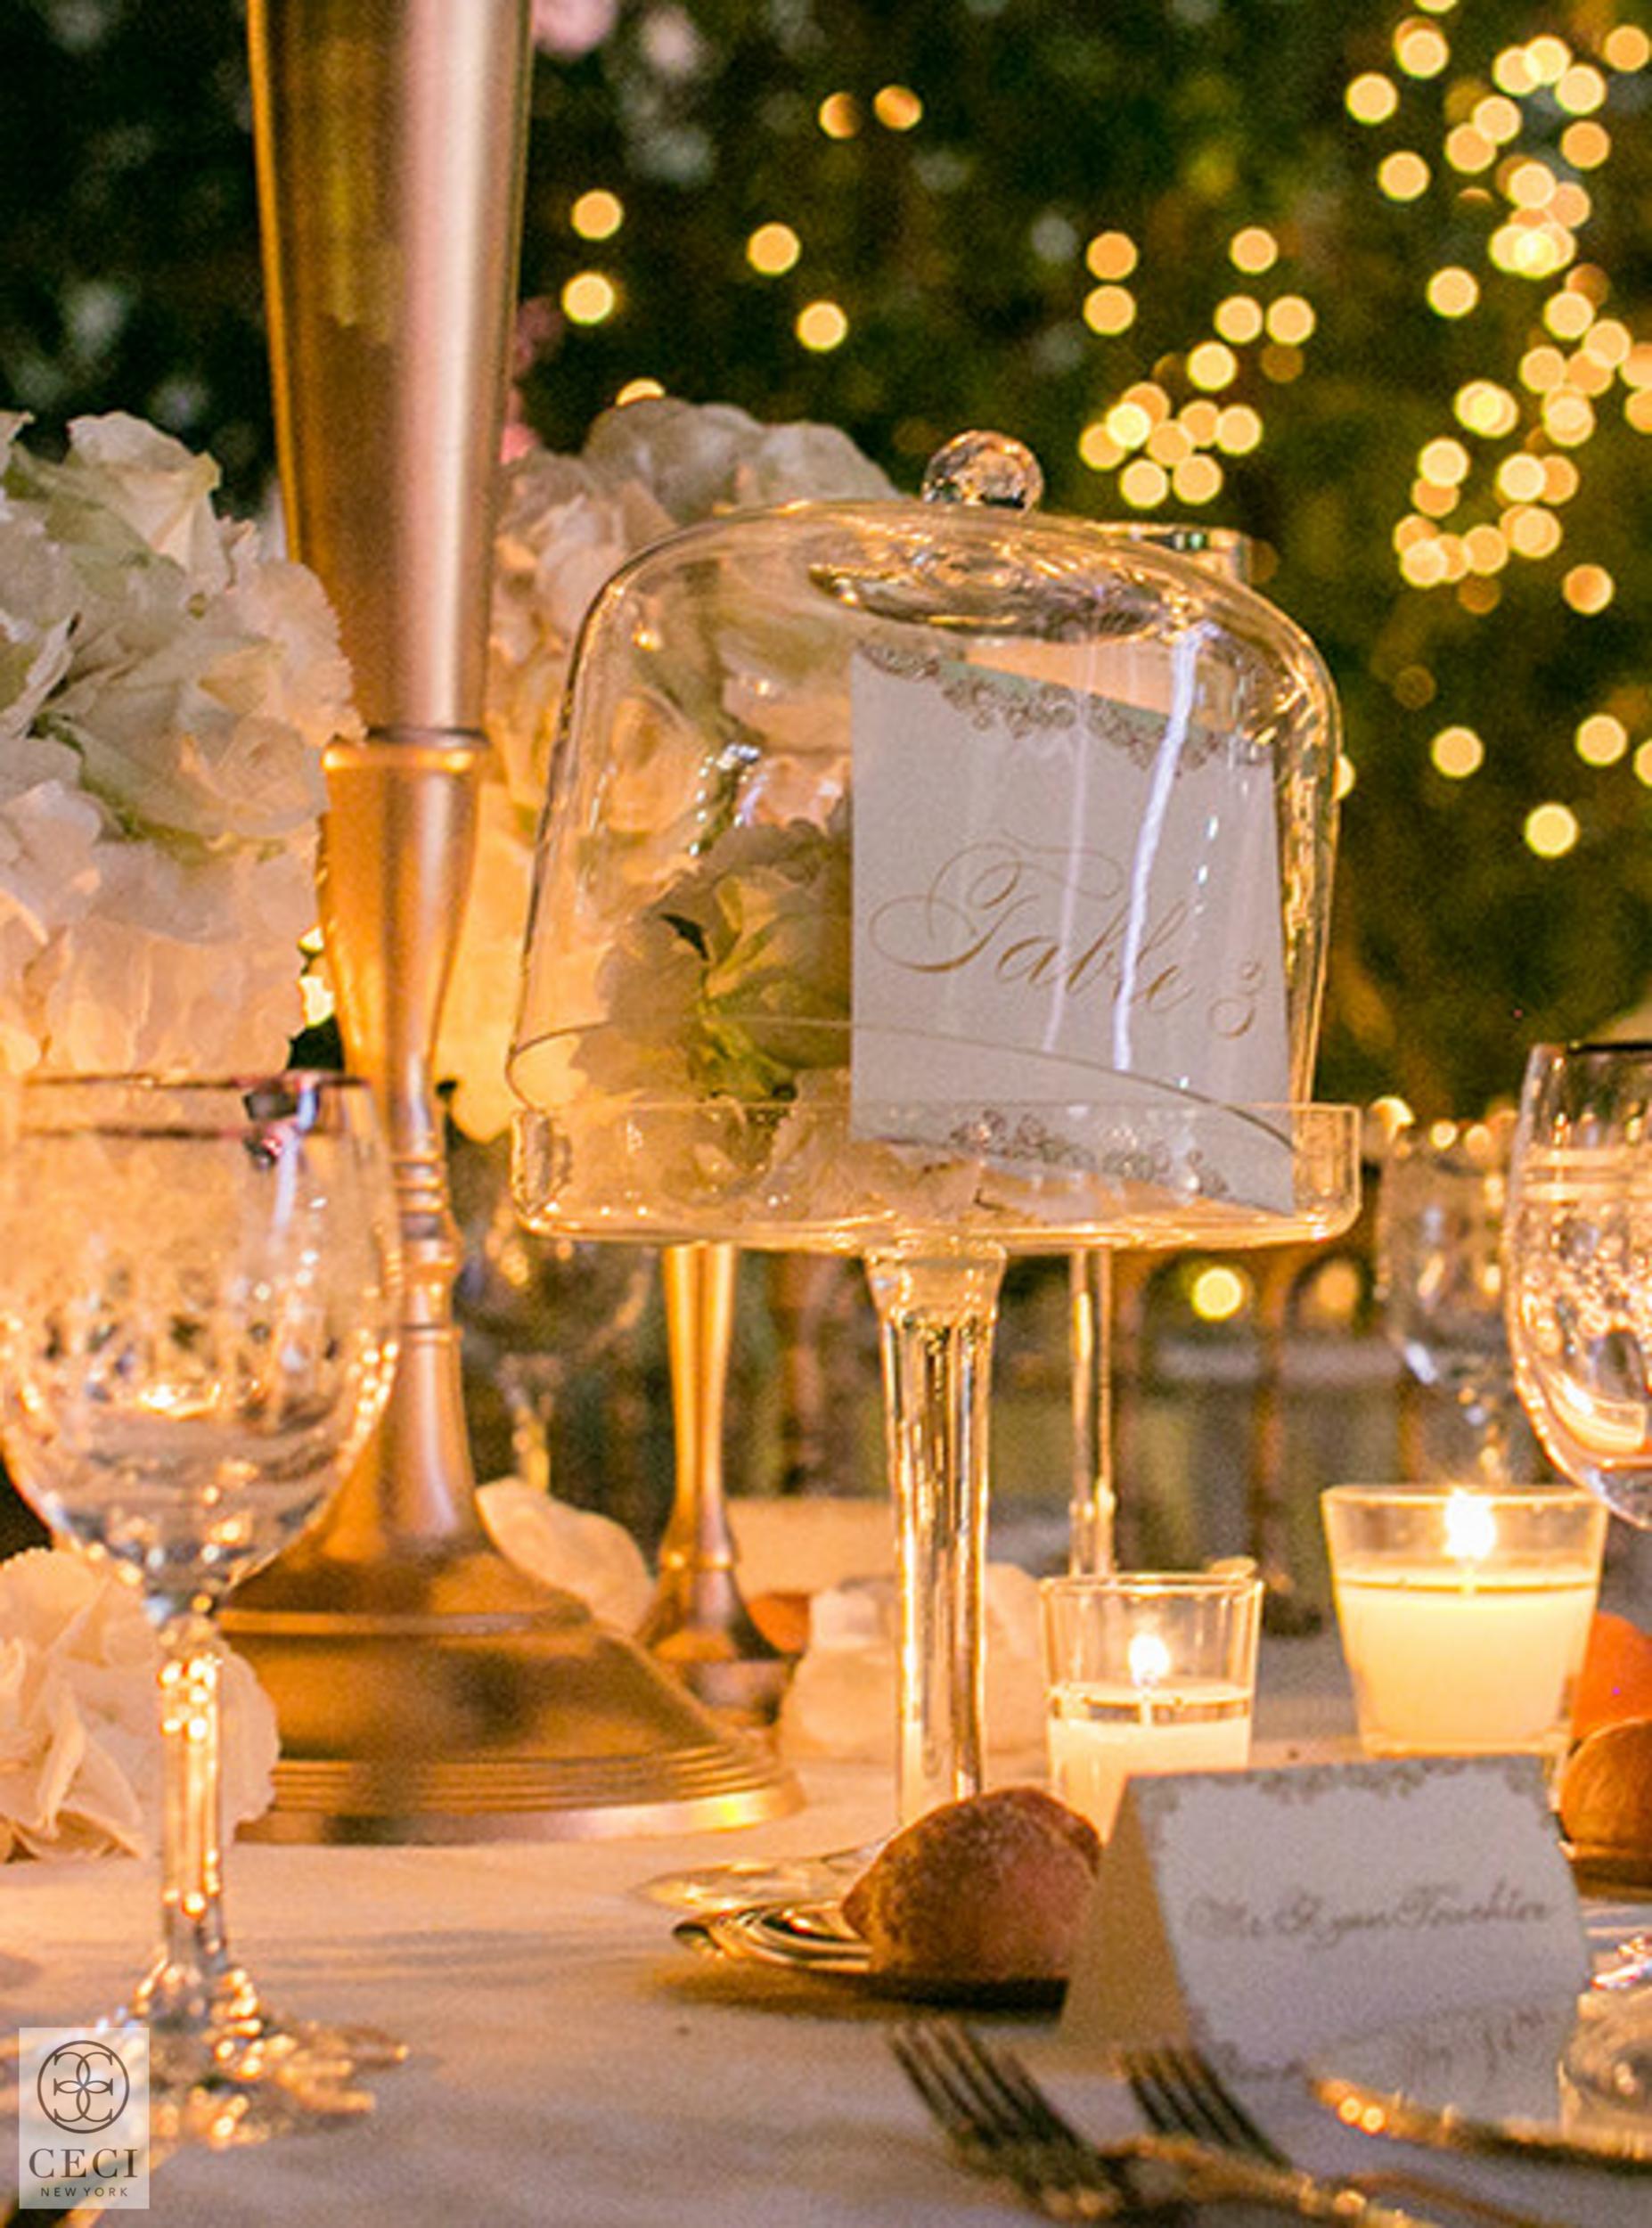 Ceci_New_York_Wedding_Lake_Como_Italy_Luxury_Style_Custom_Invitation-13.jpg